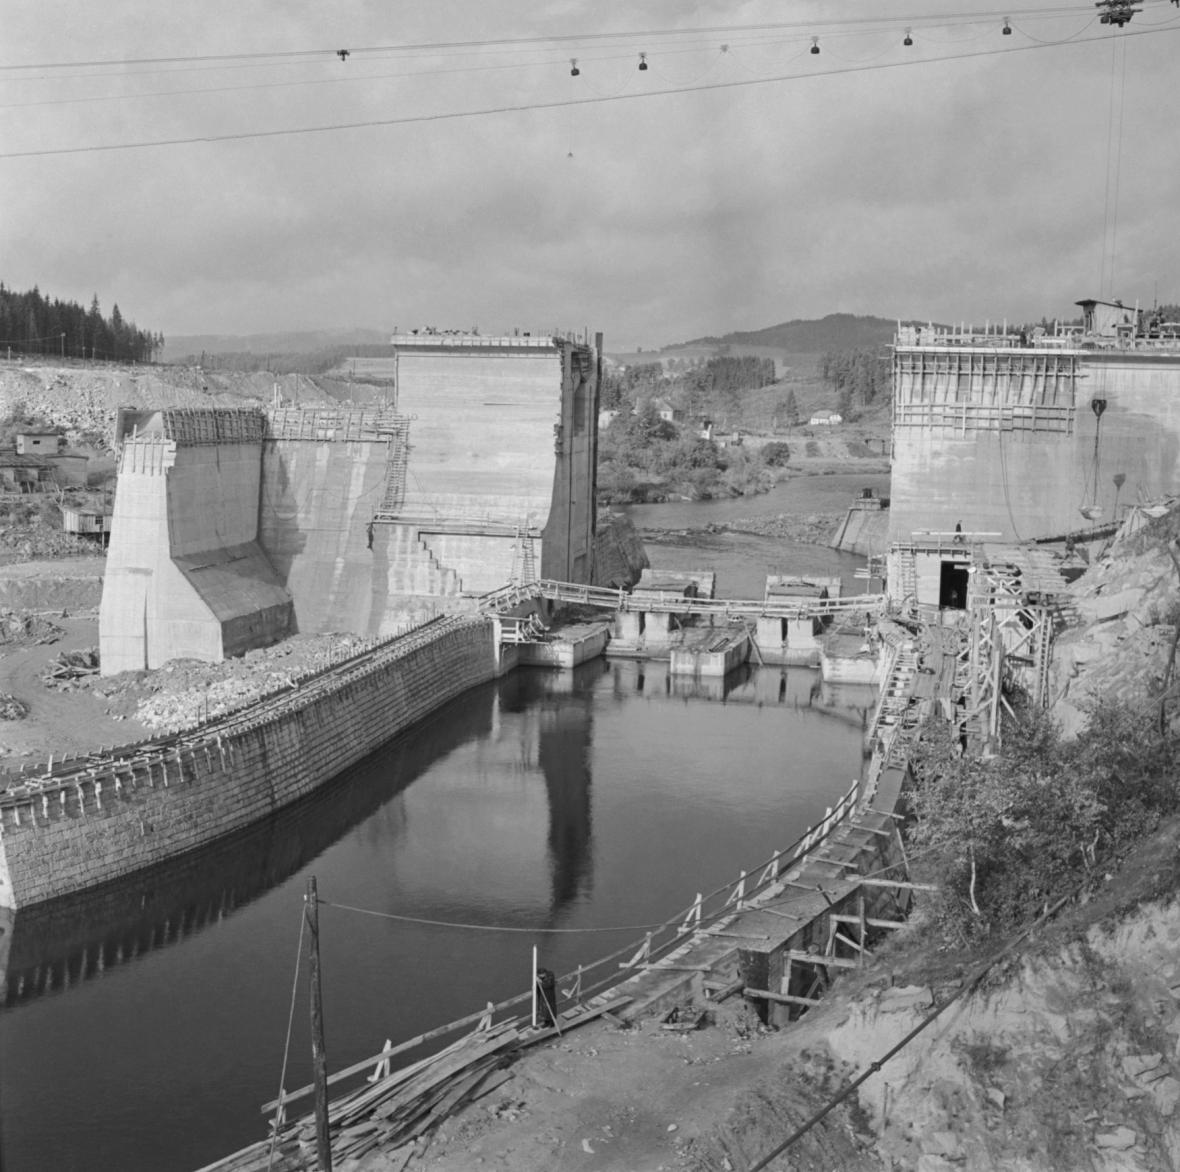 Lipno, stavba přehrady, 1956